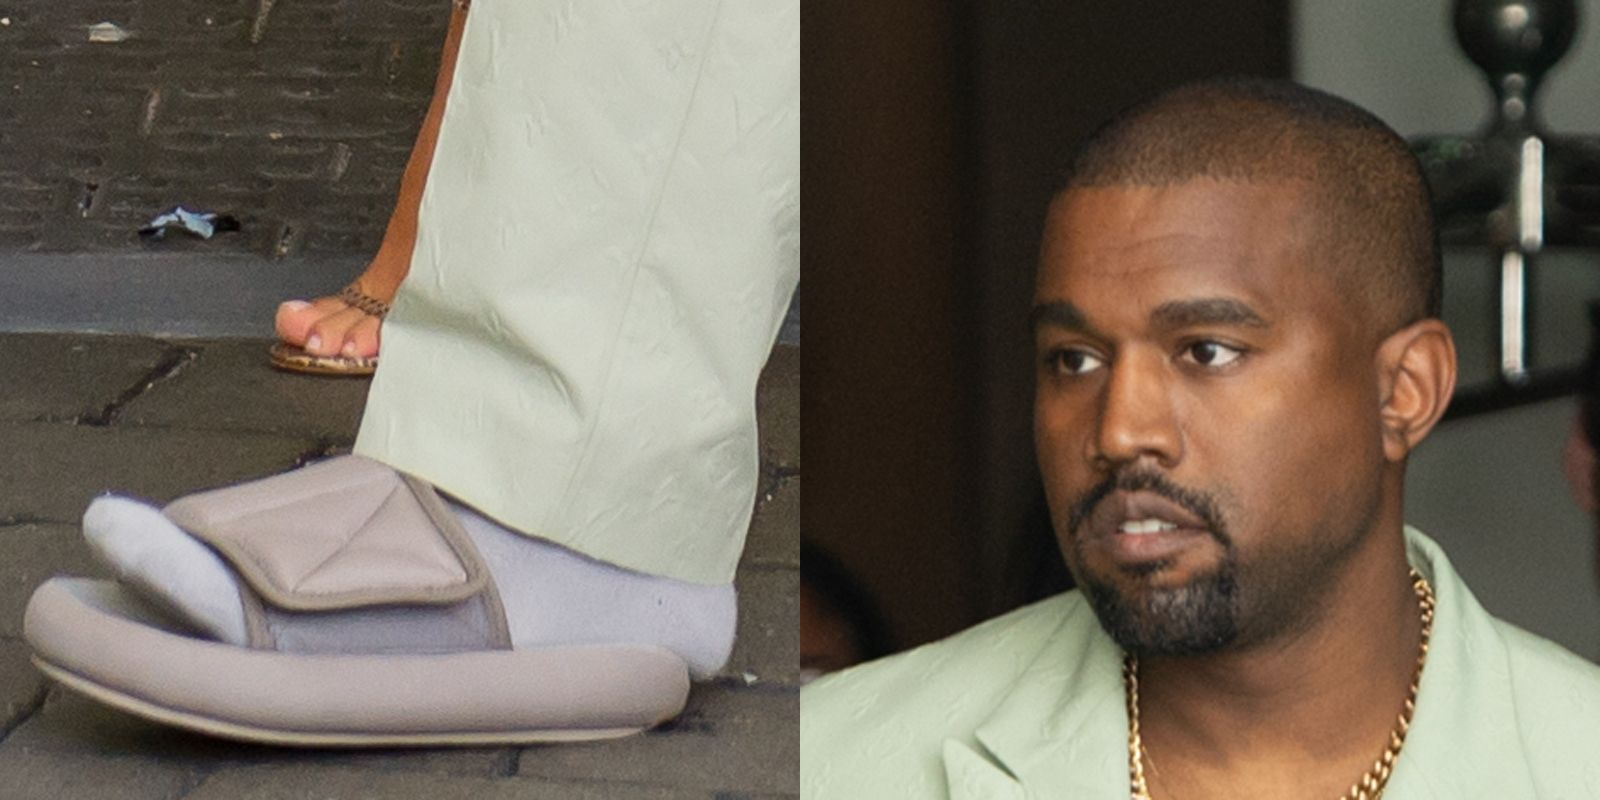 9deaf25c003 Kanye West Wore Very Small Slides to 2 Chainz Wedding in Miami -- Kim  Kardashian Yeezy Slides